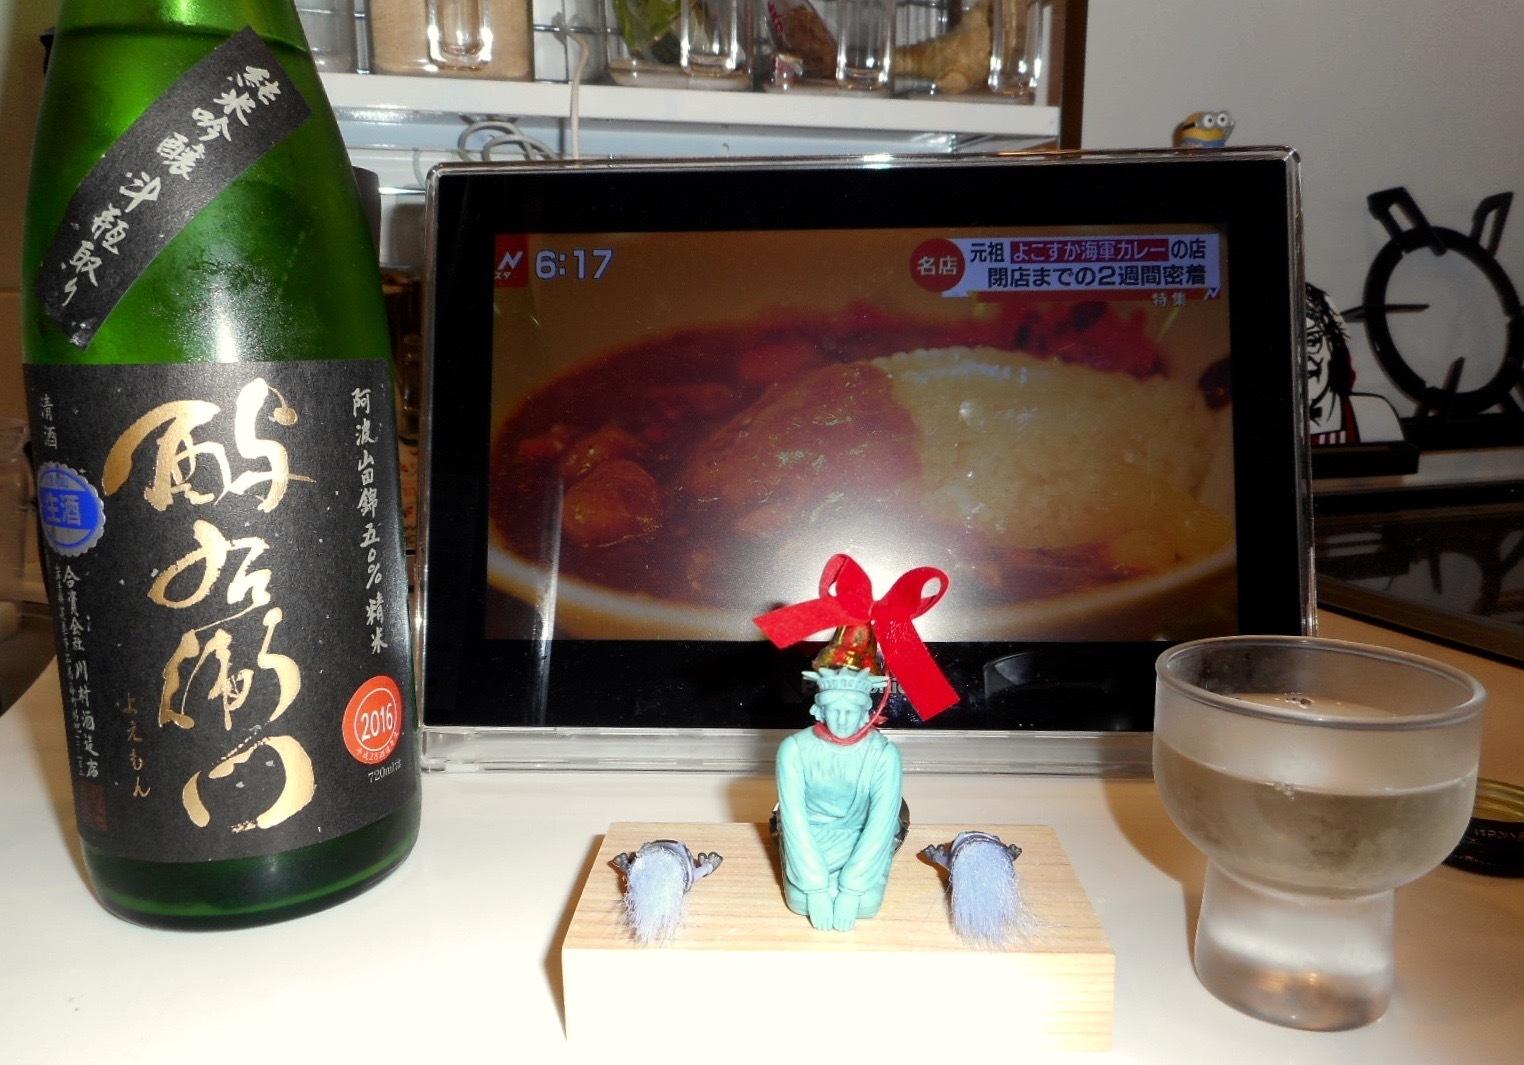 yoemon_yamada50tobin28by4.jpg